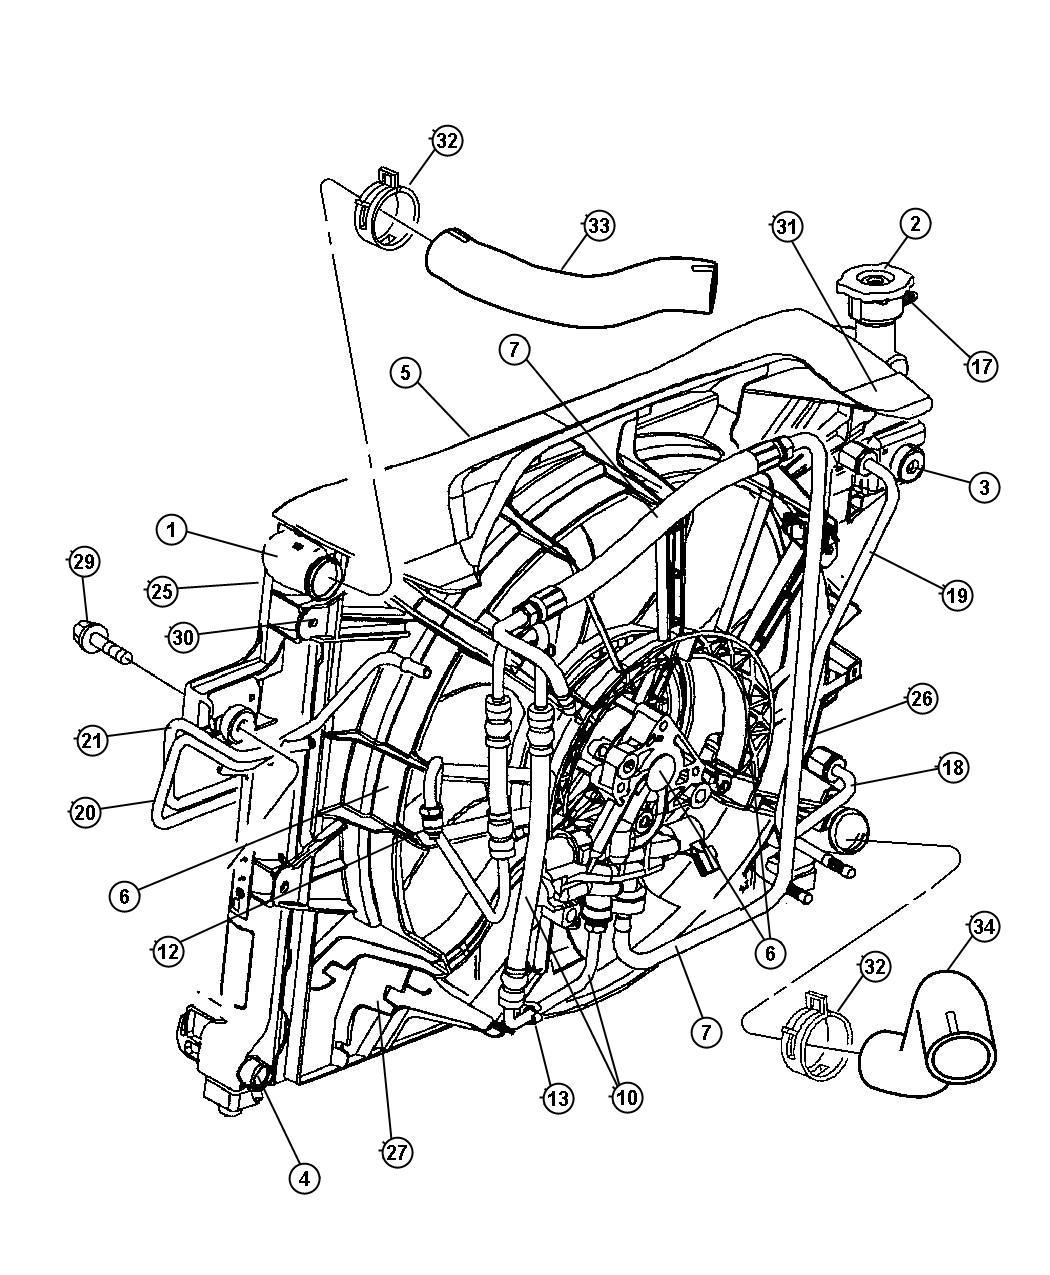 John Deere Dog Harness, John, Free Engine Image For User